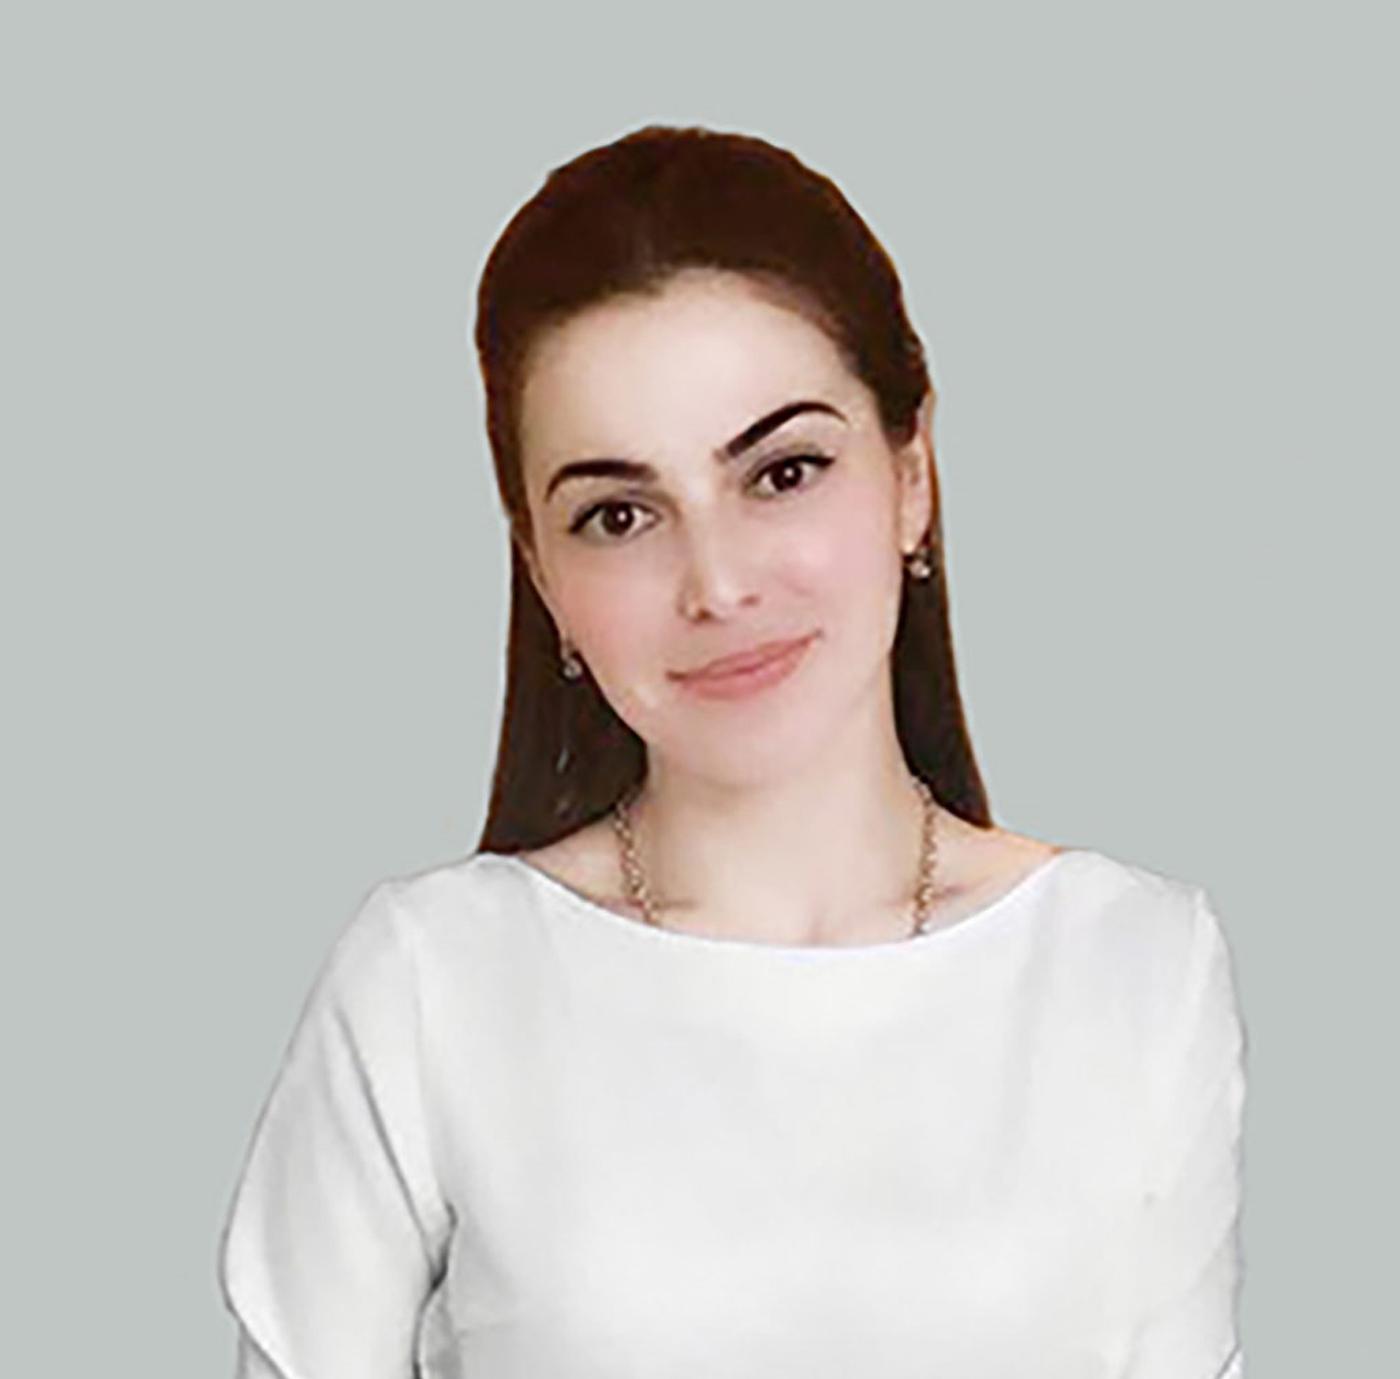 Карапетян Валентина Вартеваровна